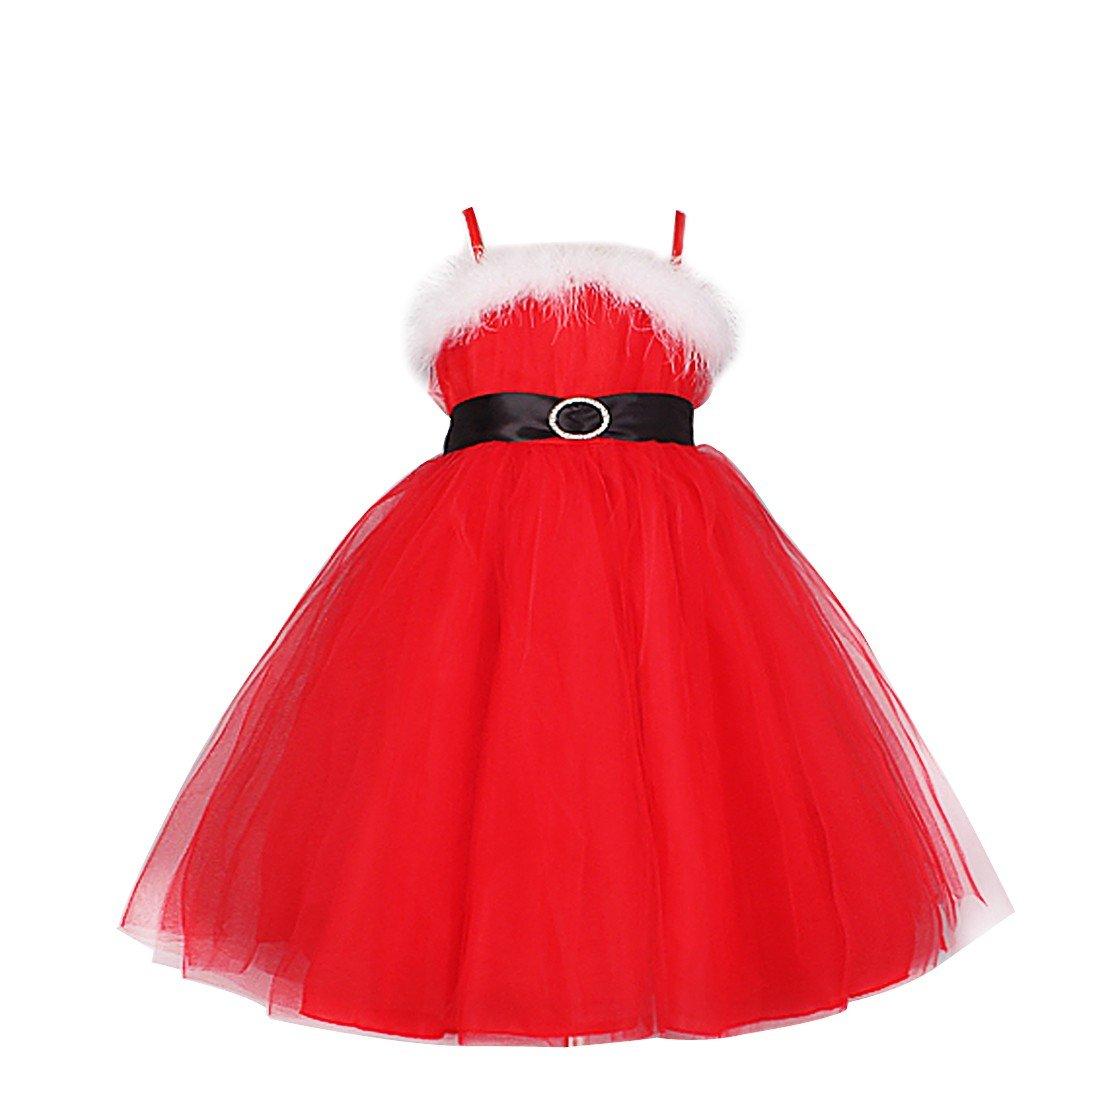 YiZYiF Baby Girl's Christmas Sash Bow Spaghetti Straps Party Dress Up 5-6